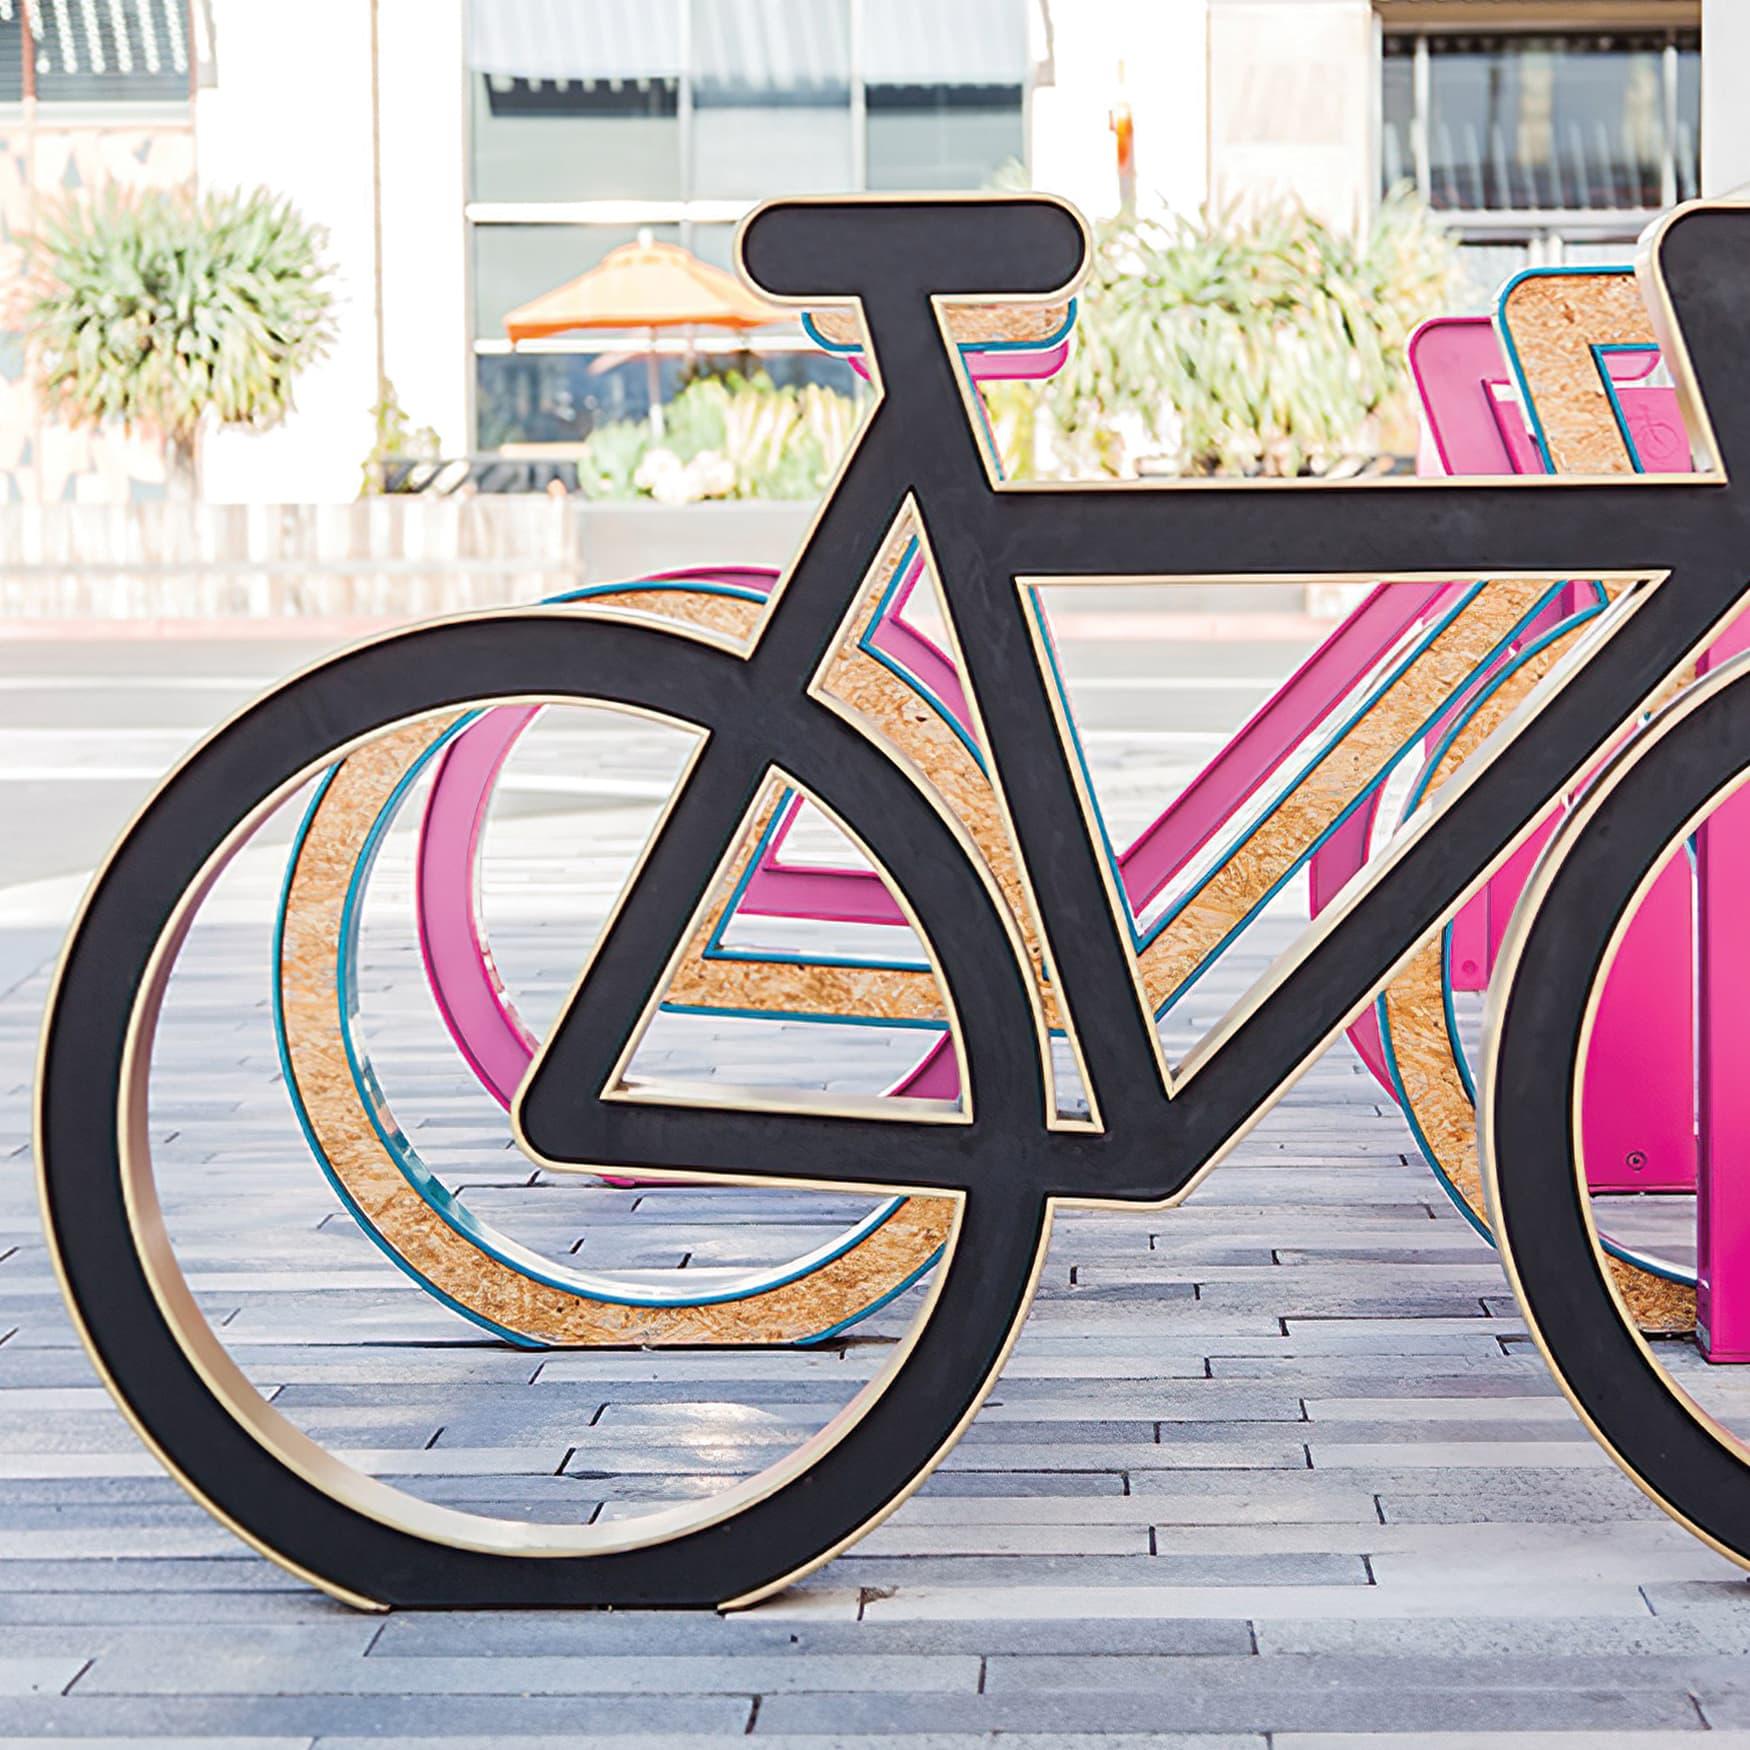 Custom and unique bike racks at Monet Avenue in Rancho Cucamonga